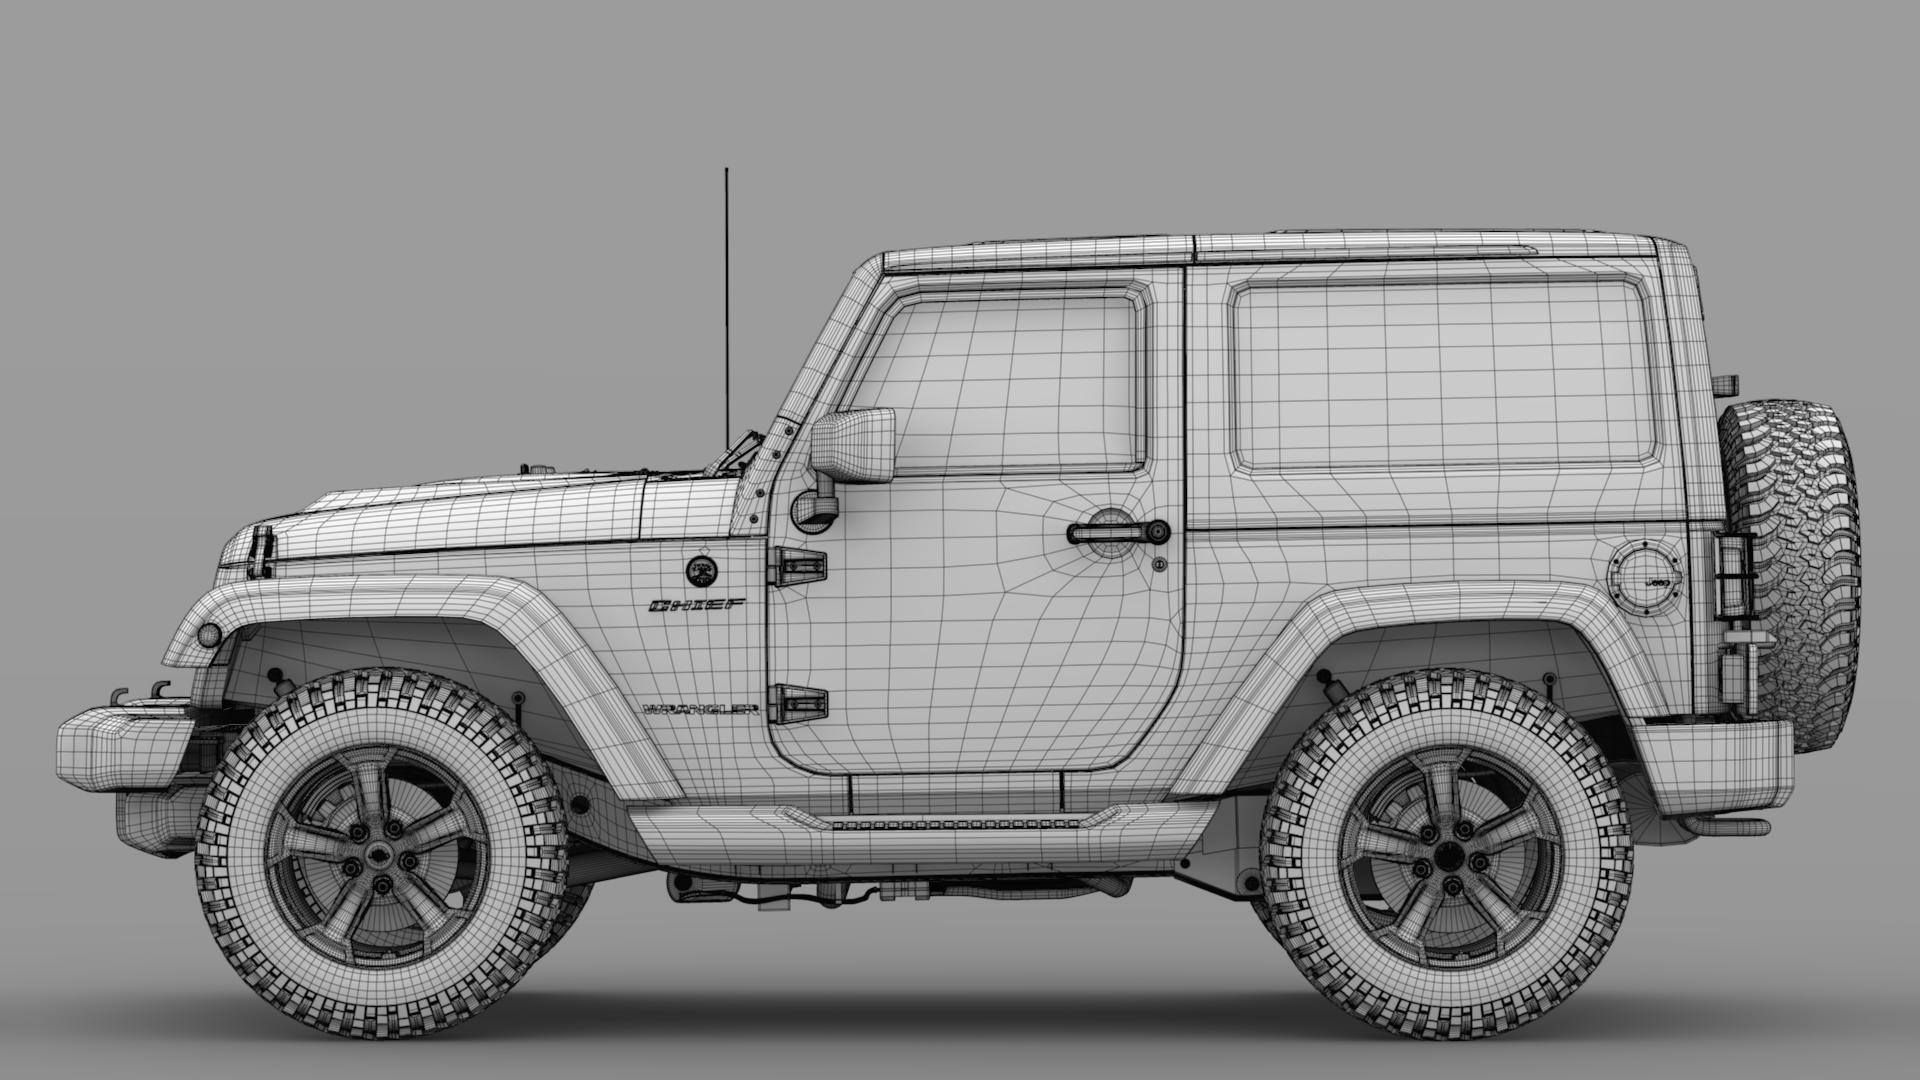 jeep wrangler chief jk 2017 3d model max fbx c4d lwo ma mb hrc xsi obj 276887